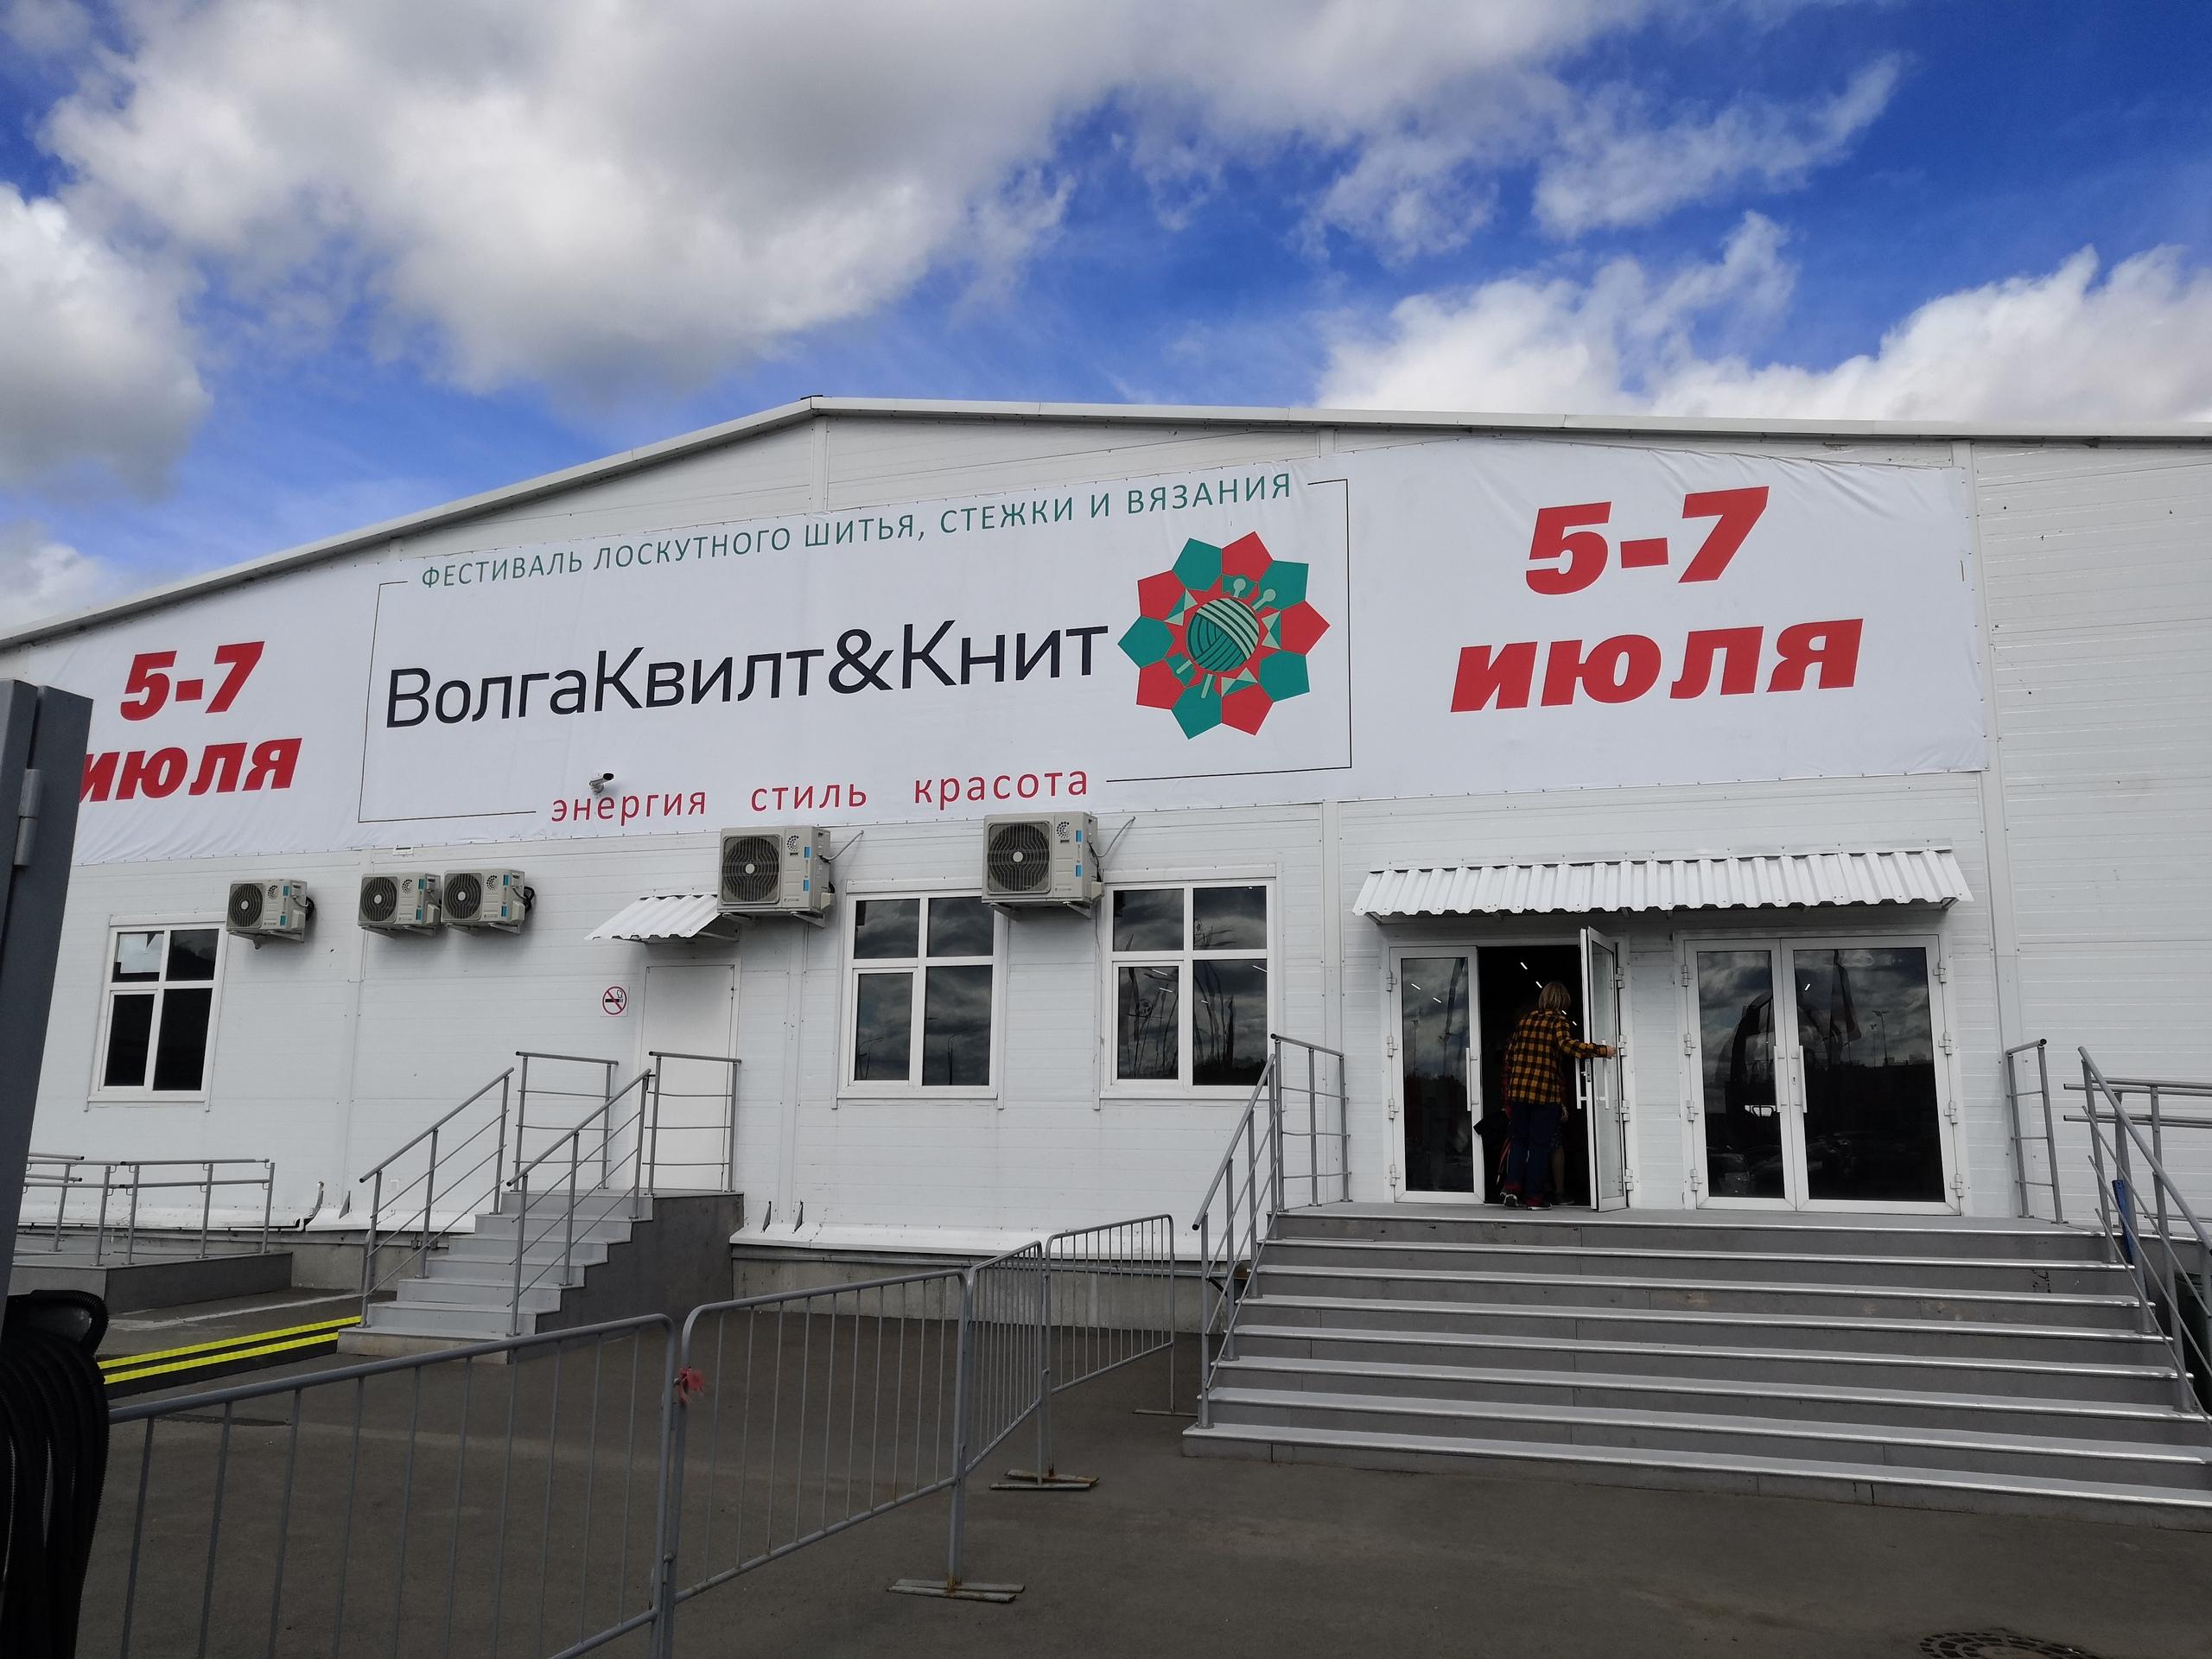 Волга Квилт & Книт 2019 - Страница 2 AWX9HYk4mnA